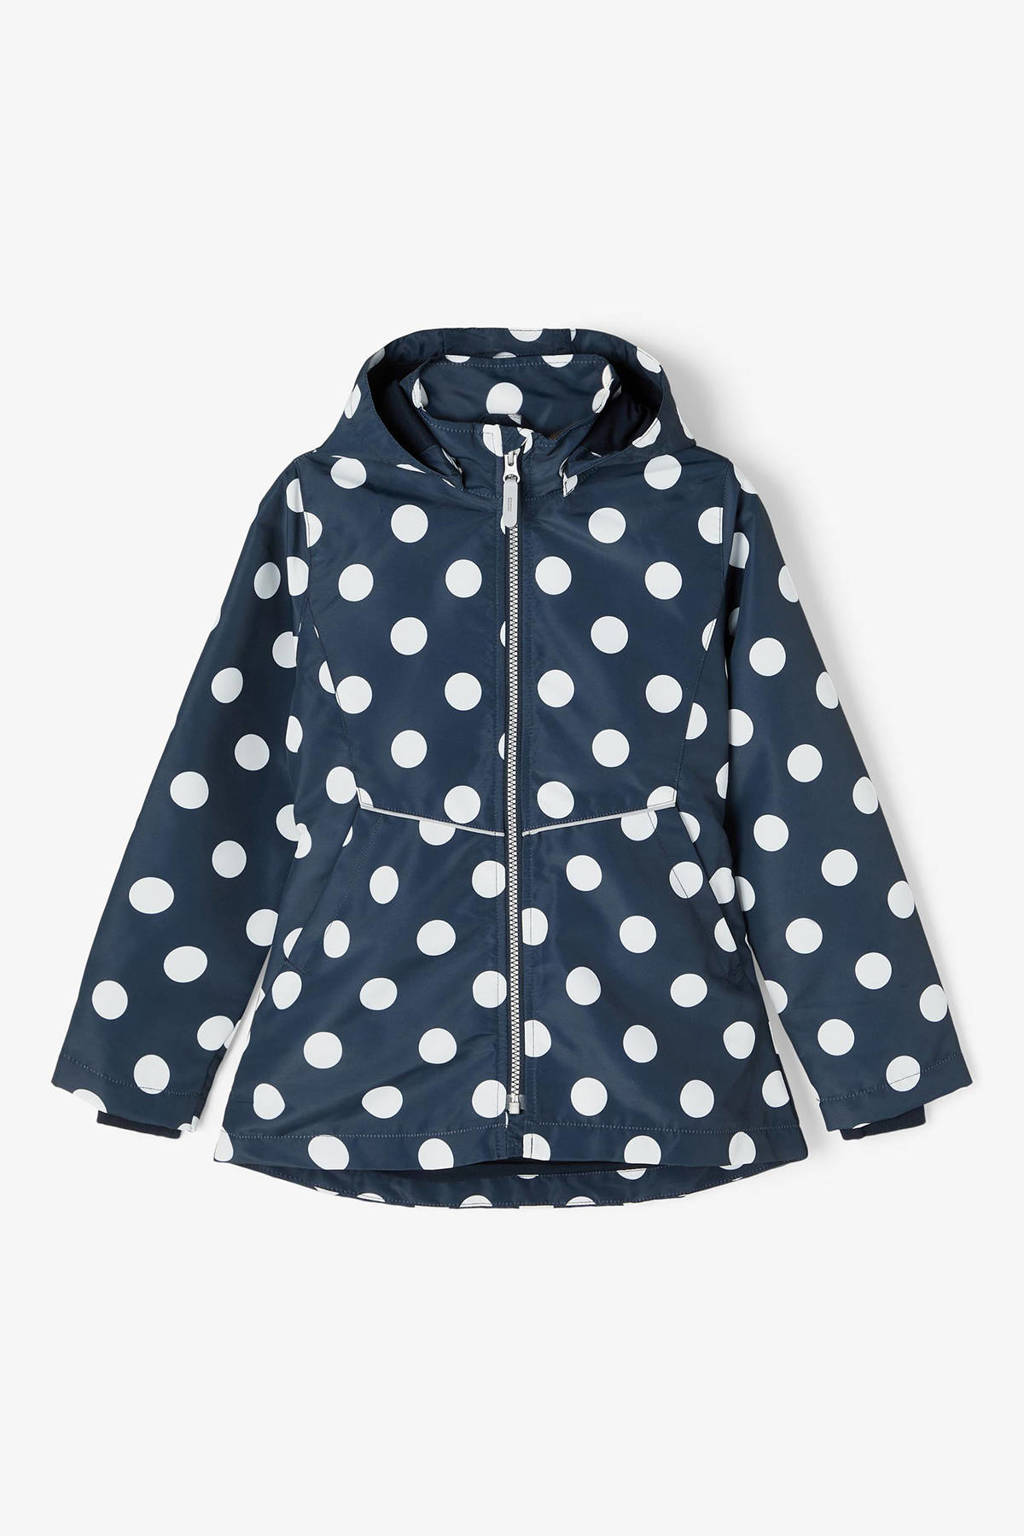 NAME IT KIDS  zomerjas Maxi met stippen donkerblauw, Donkerblauw